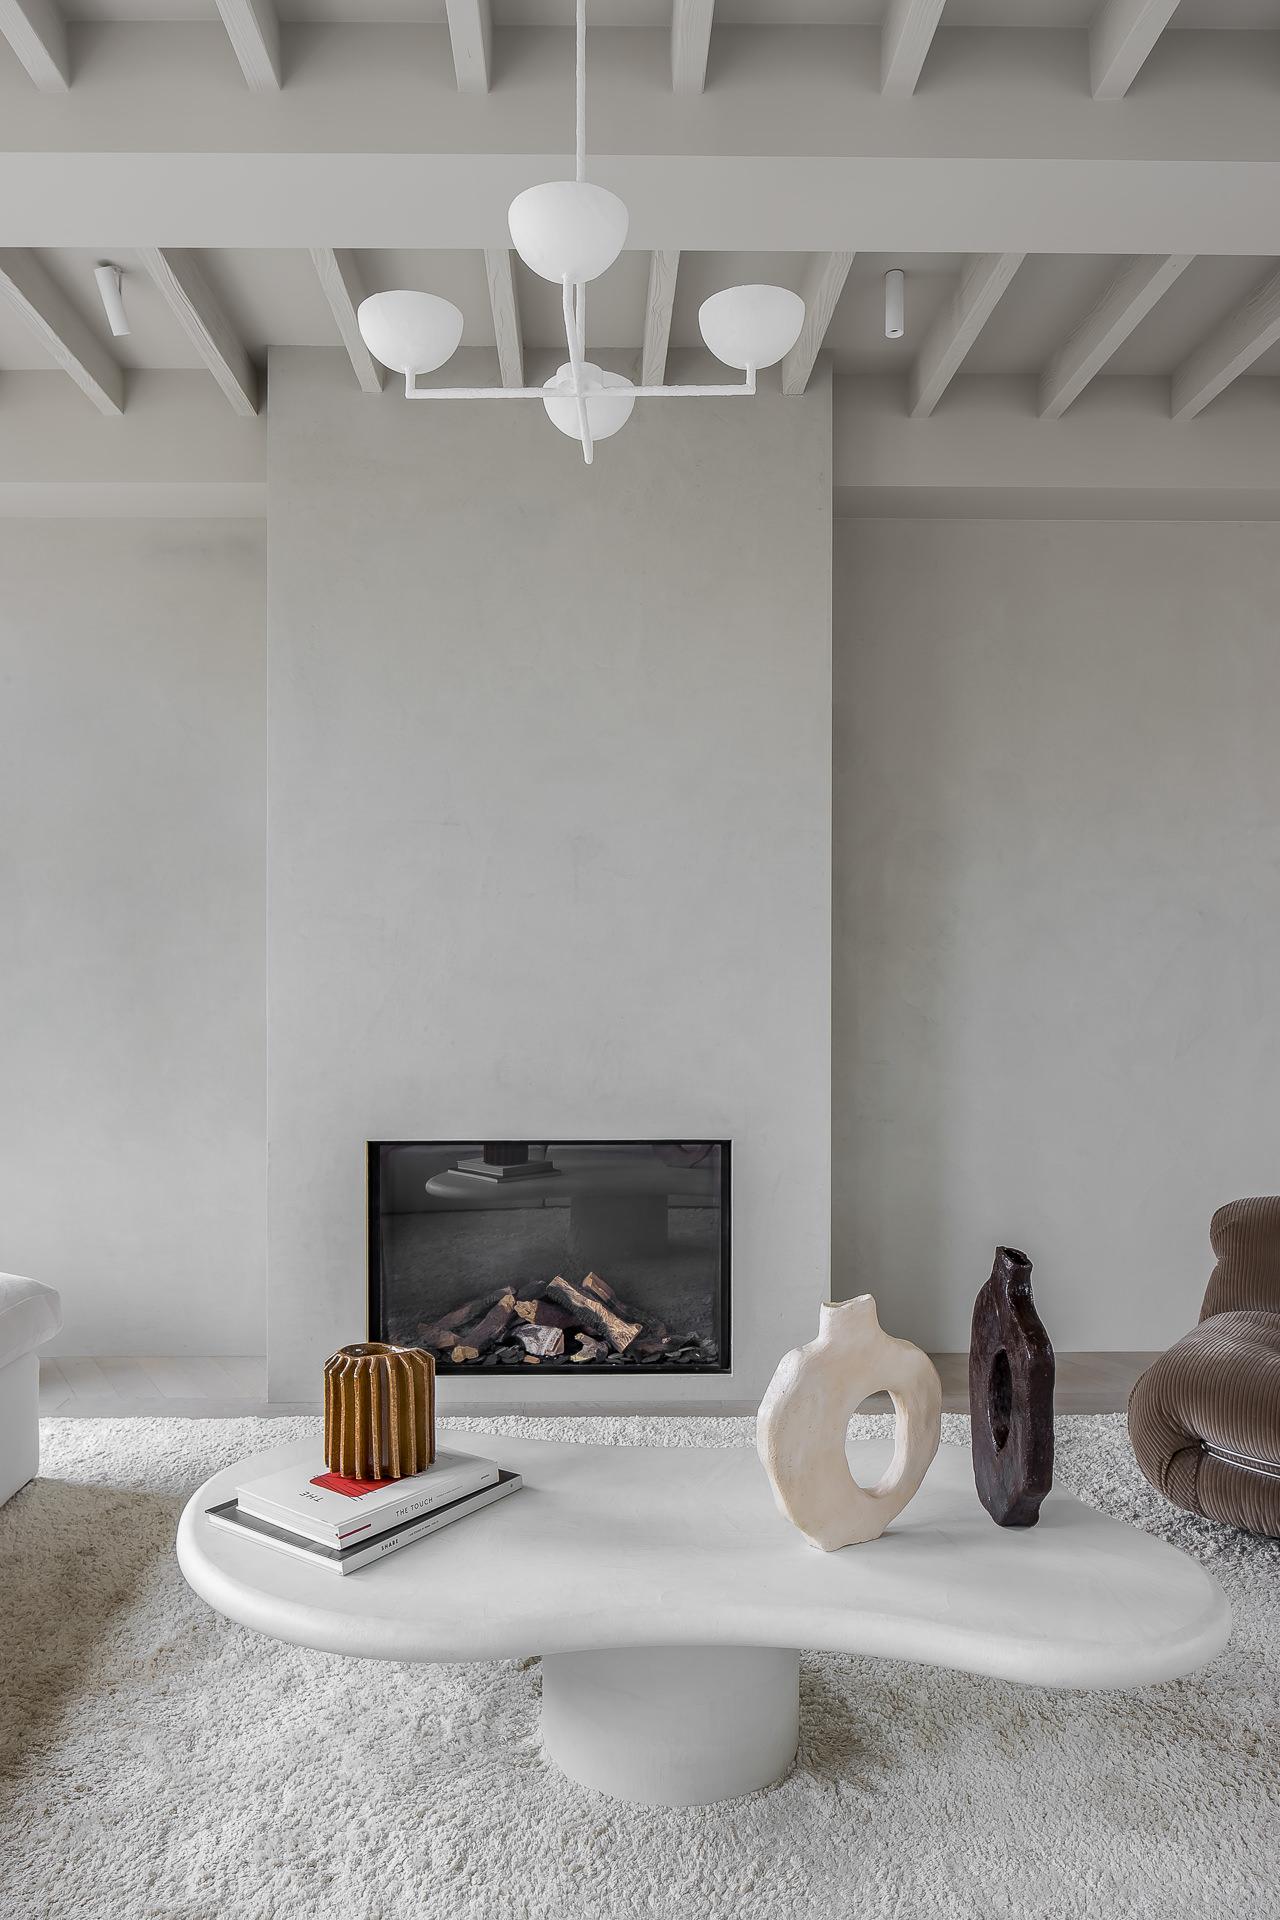 Framework Studio Residential 610 Weesperzijde Photo Thomas De Bruyne Cafeine Yellowtrace 10